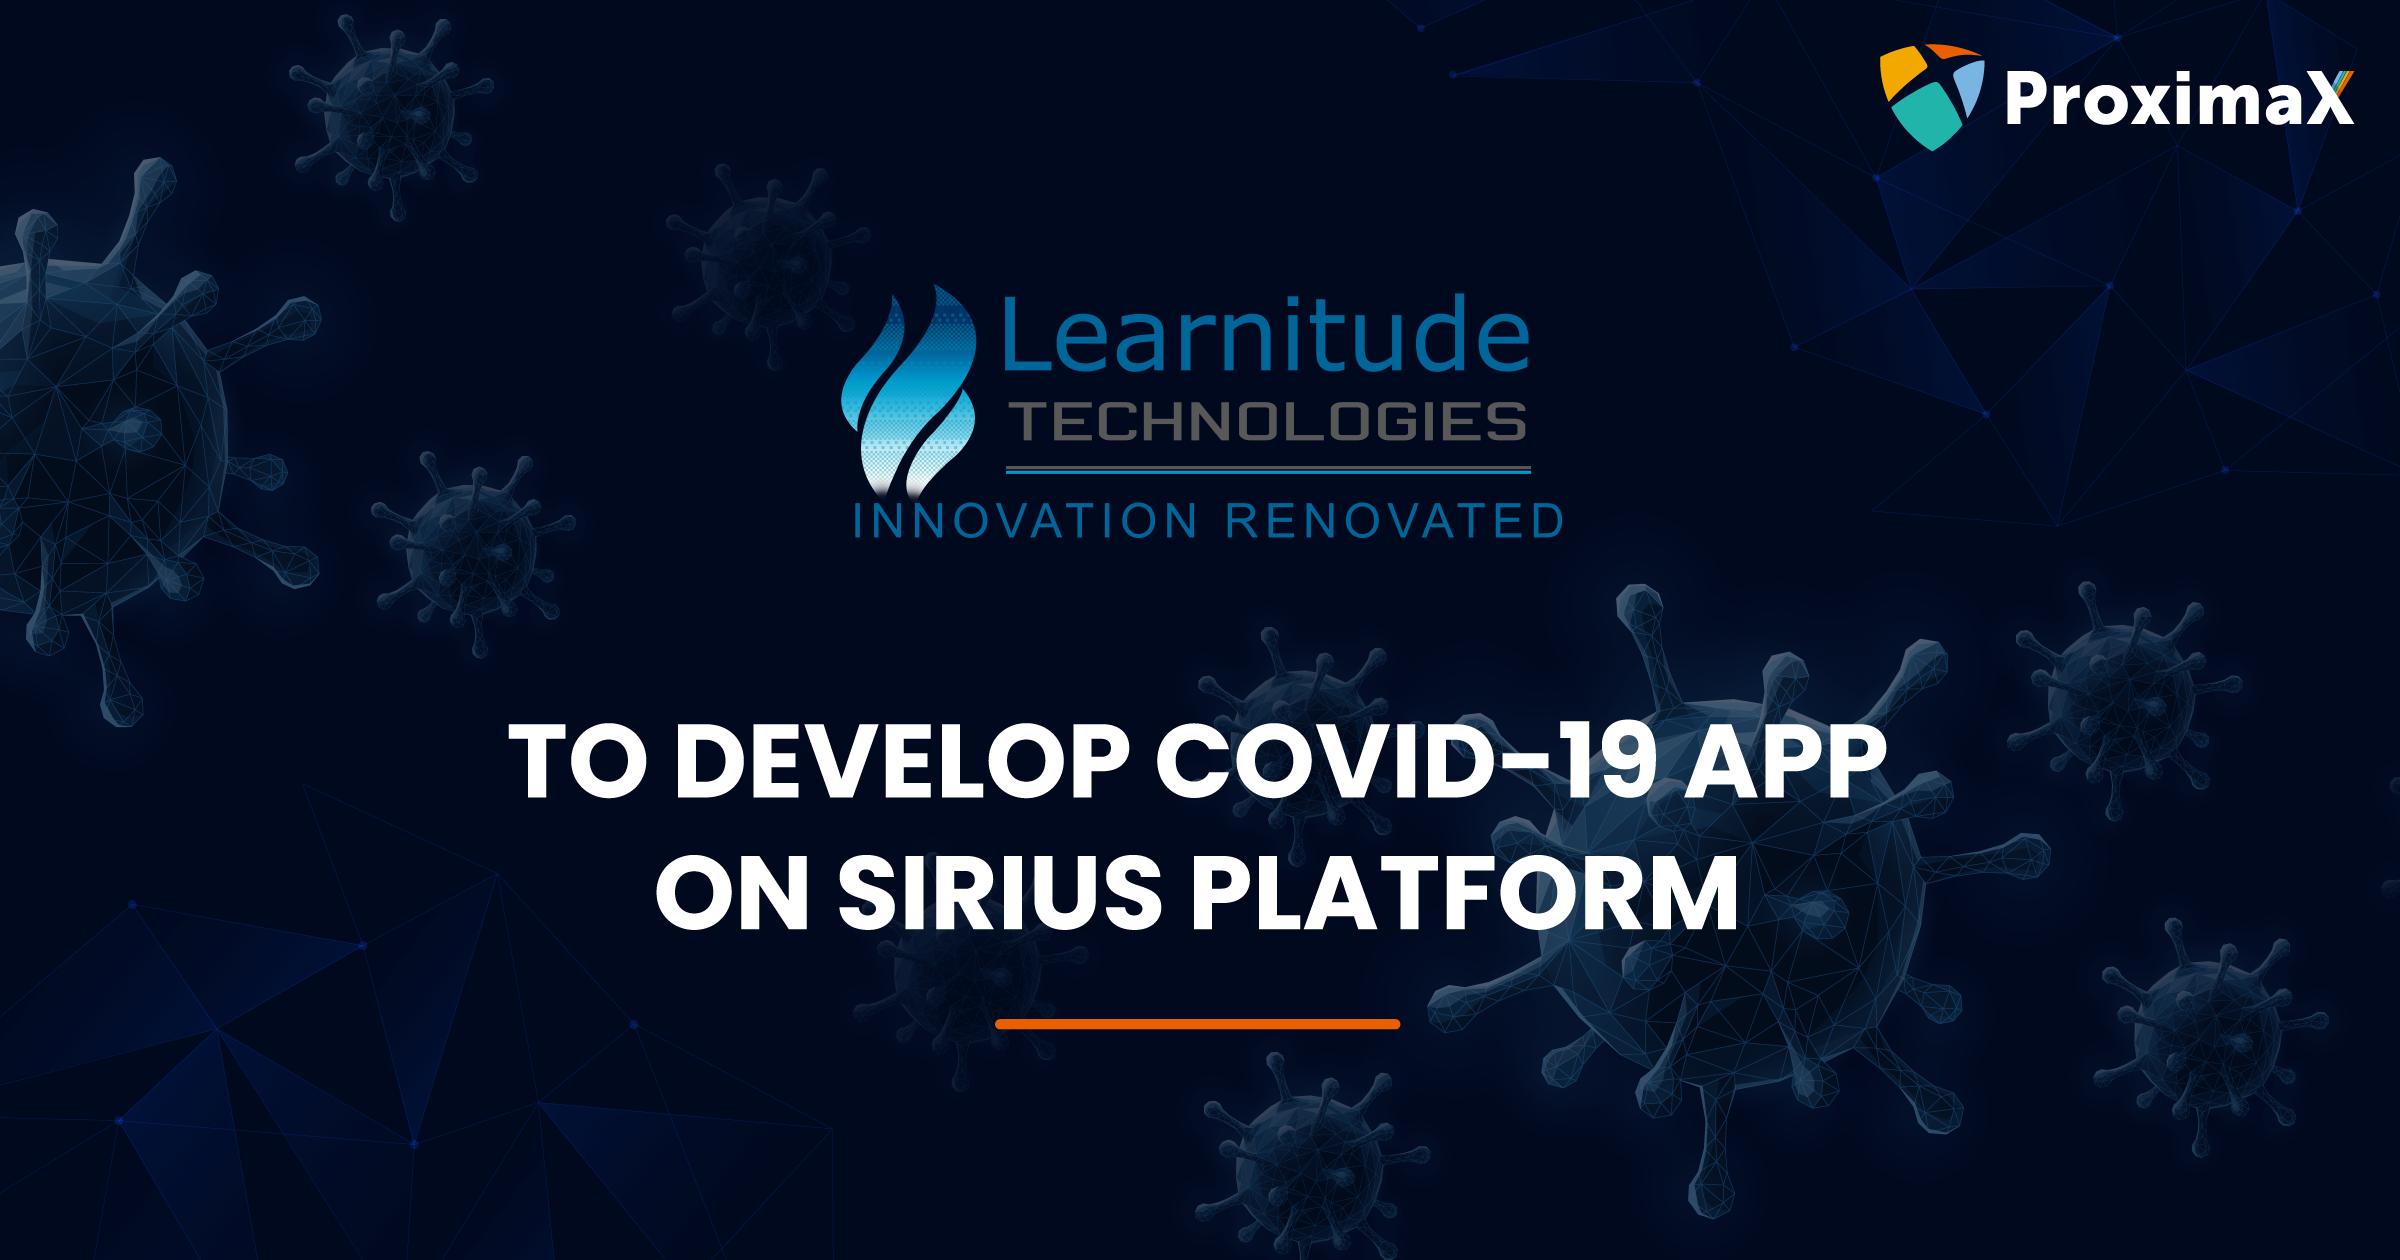 covid-19 app on sirius platform